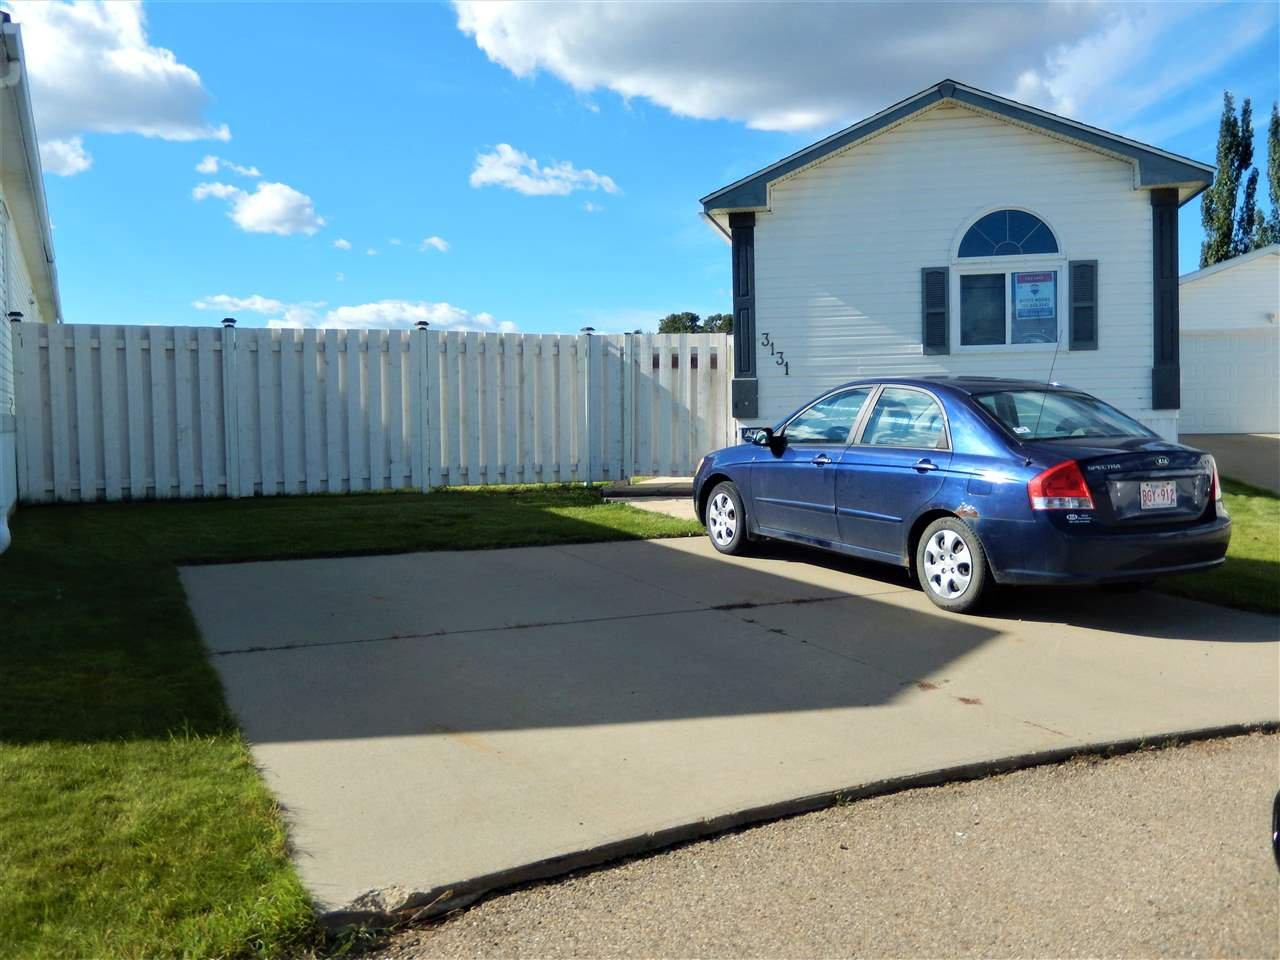 Main Photo: 3131 Lakewood Crescent in Edmonton: Zone 59 Mobile for sale : MLS®# E4214101